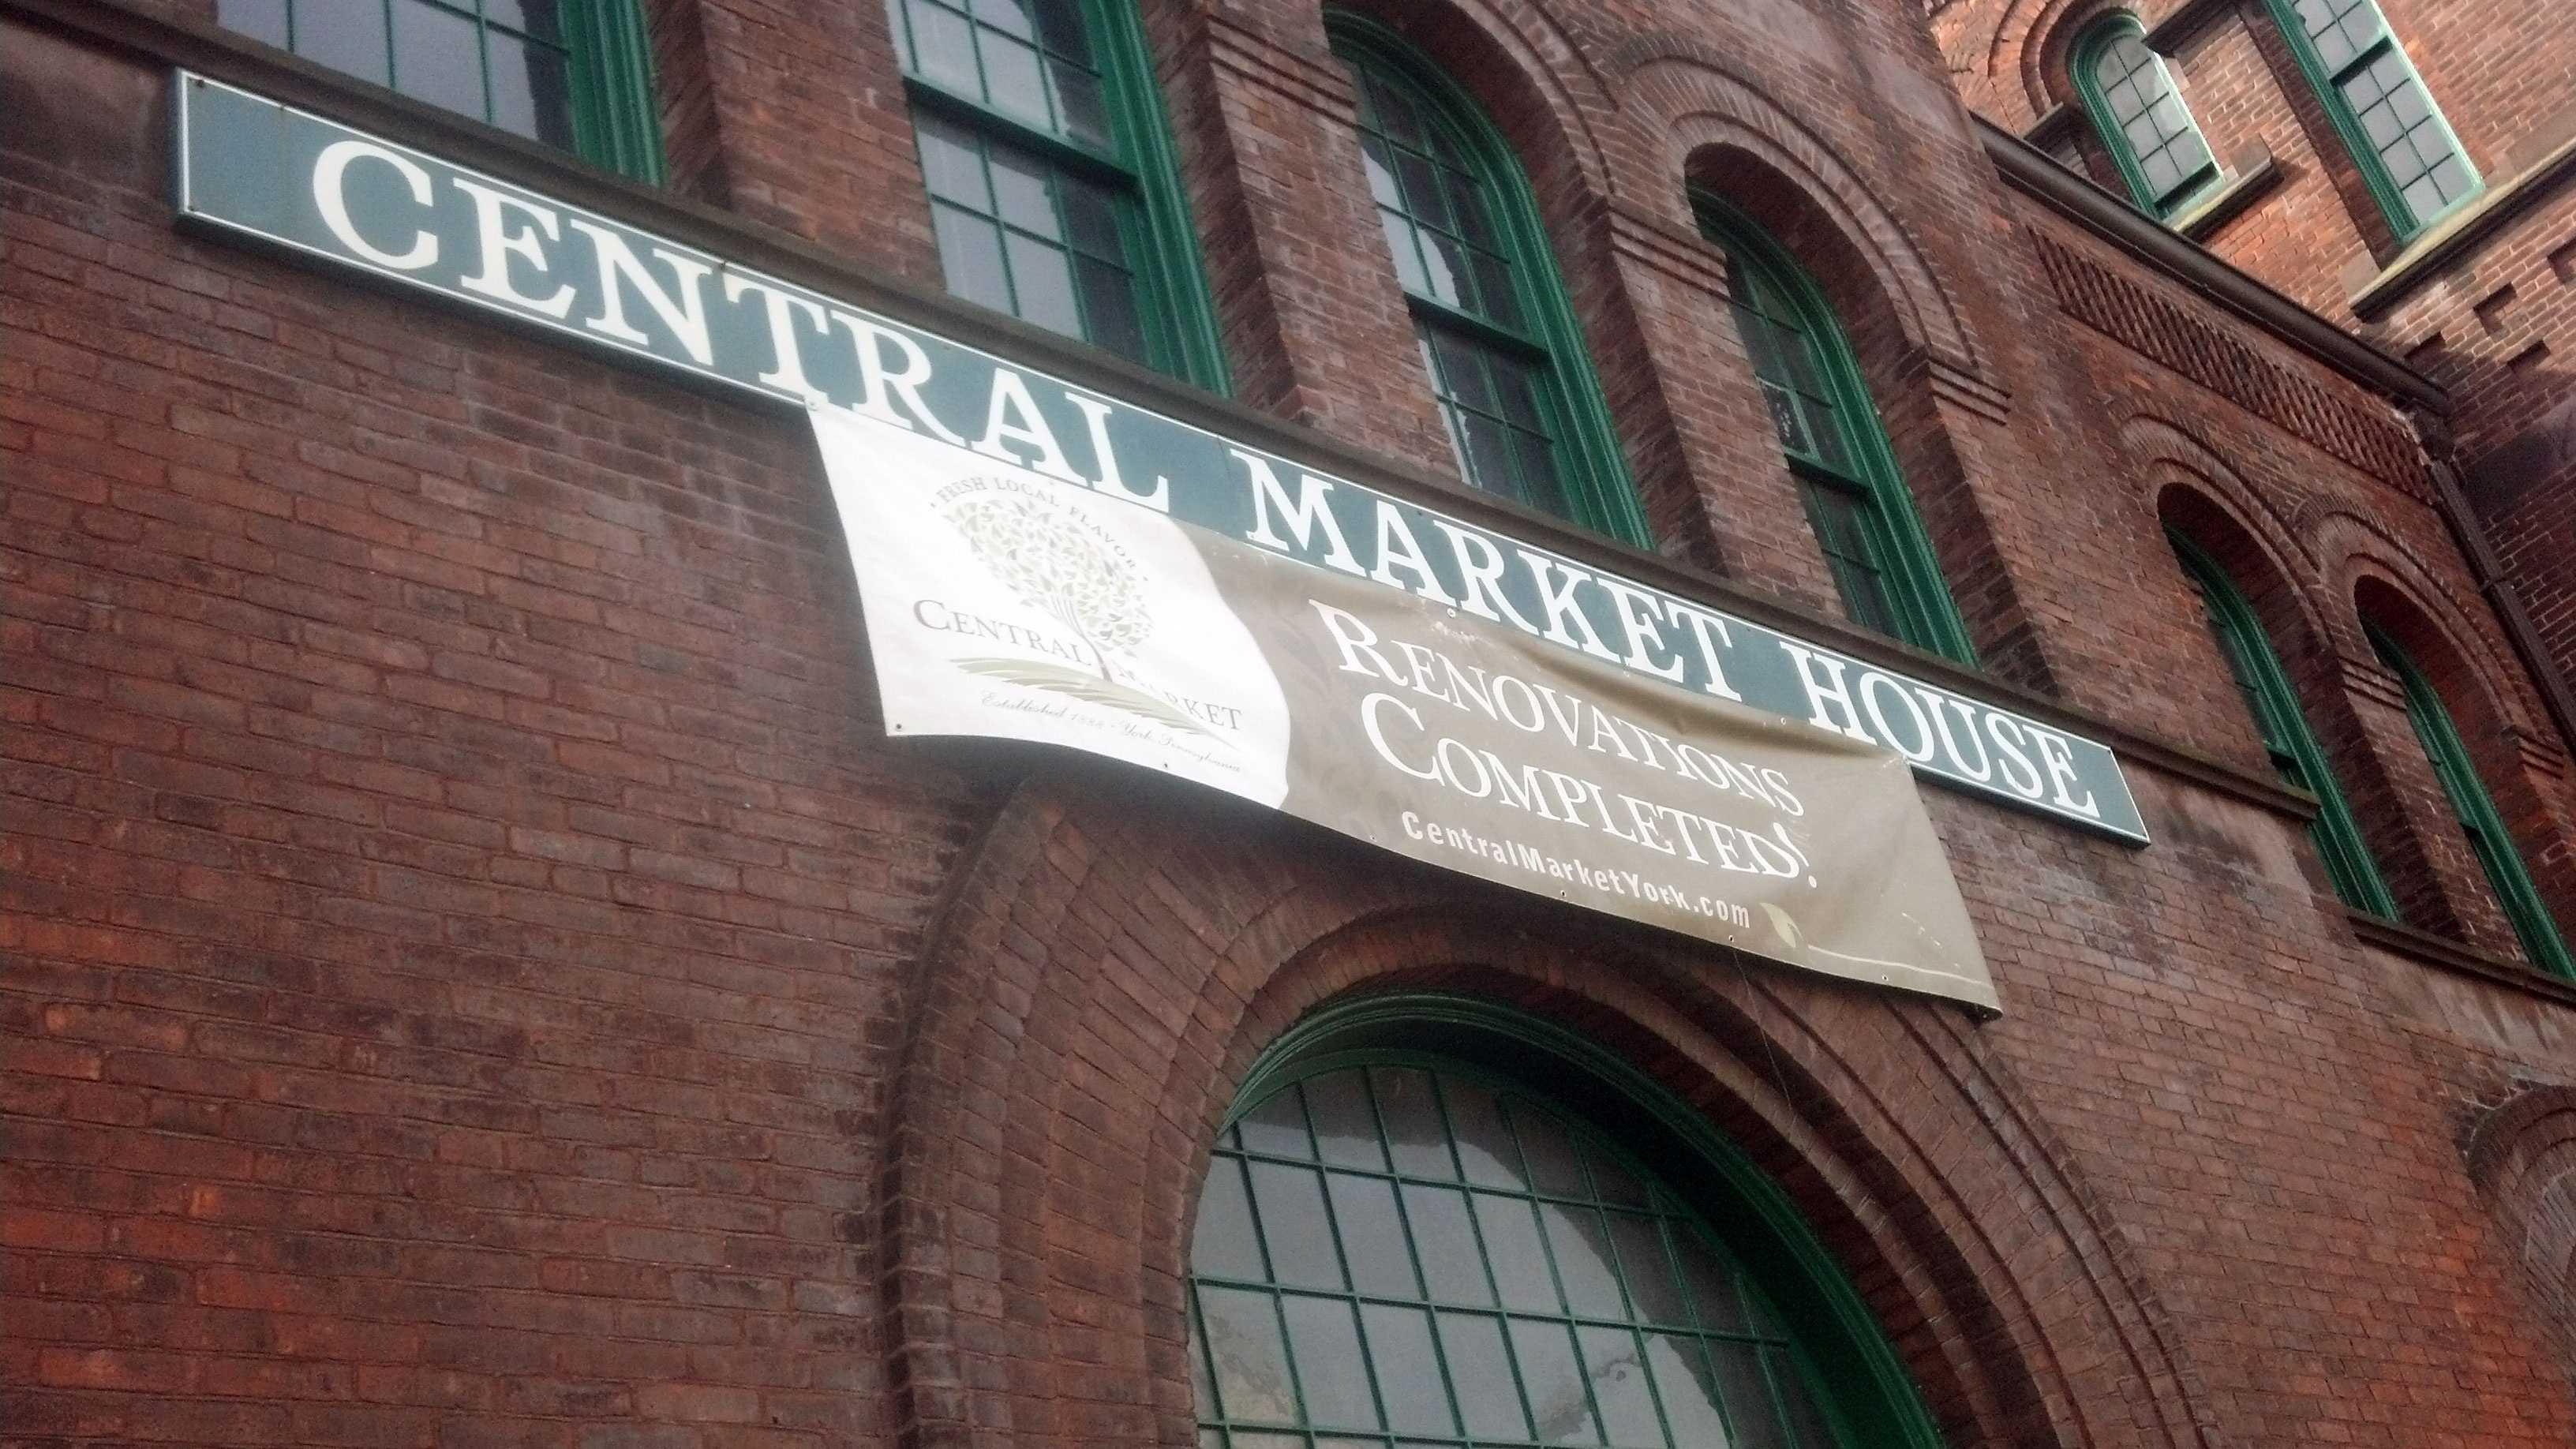 4.4 York's Central Market